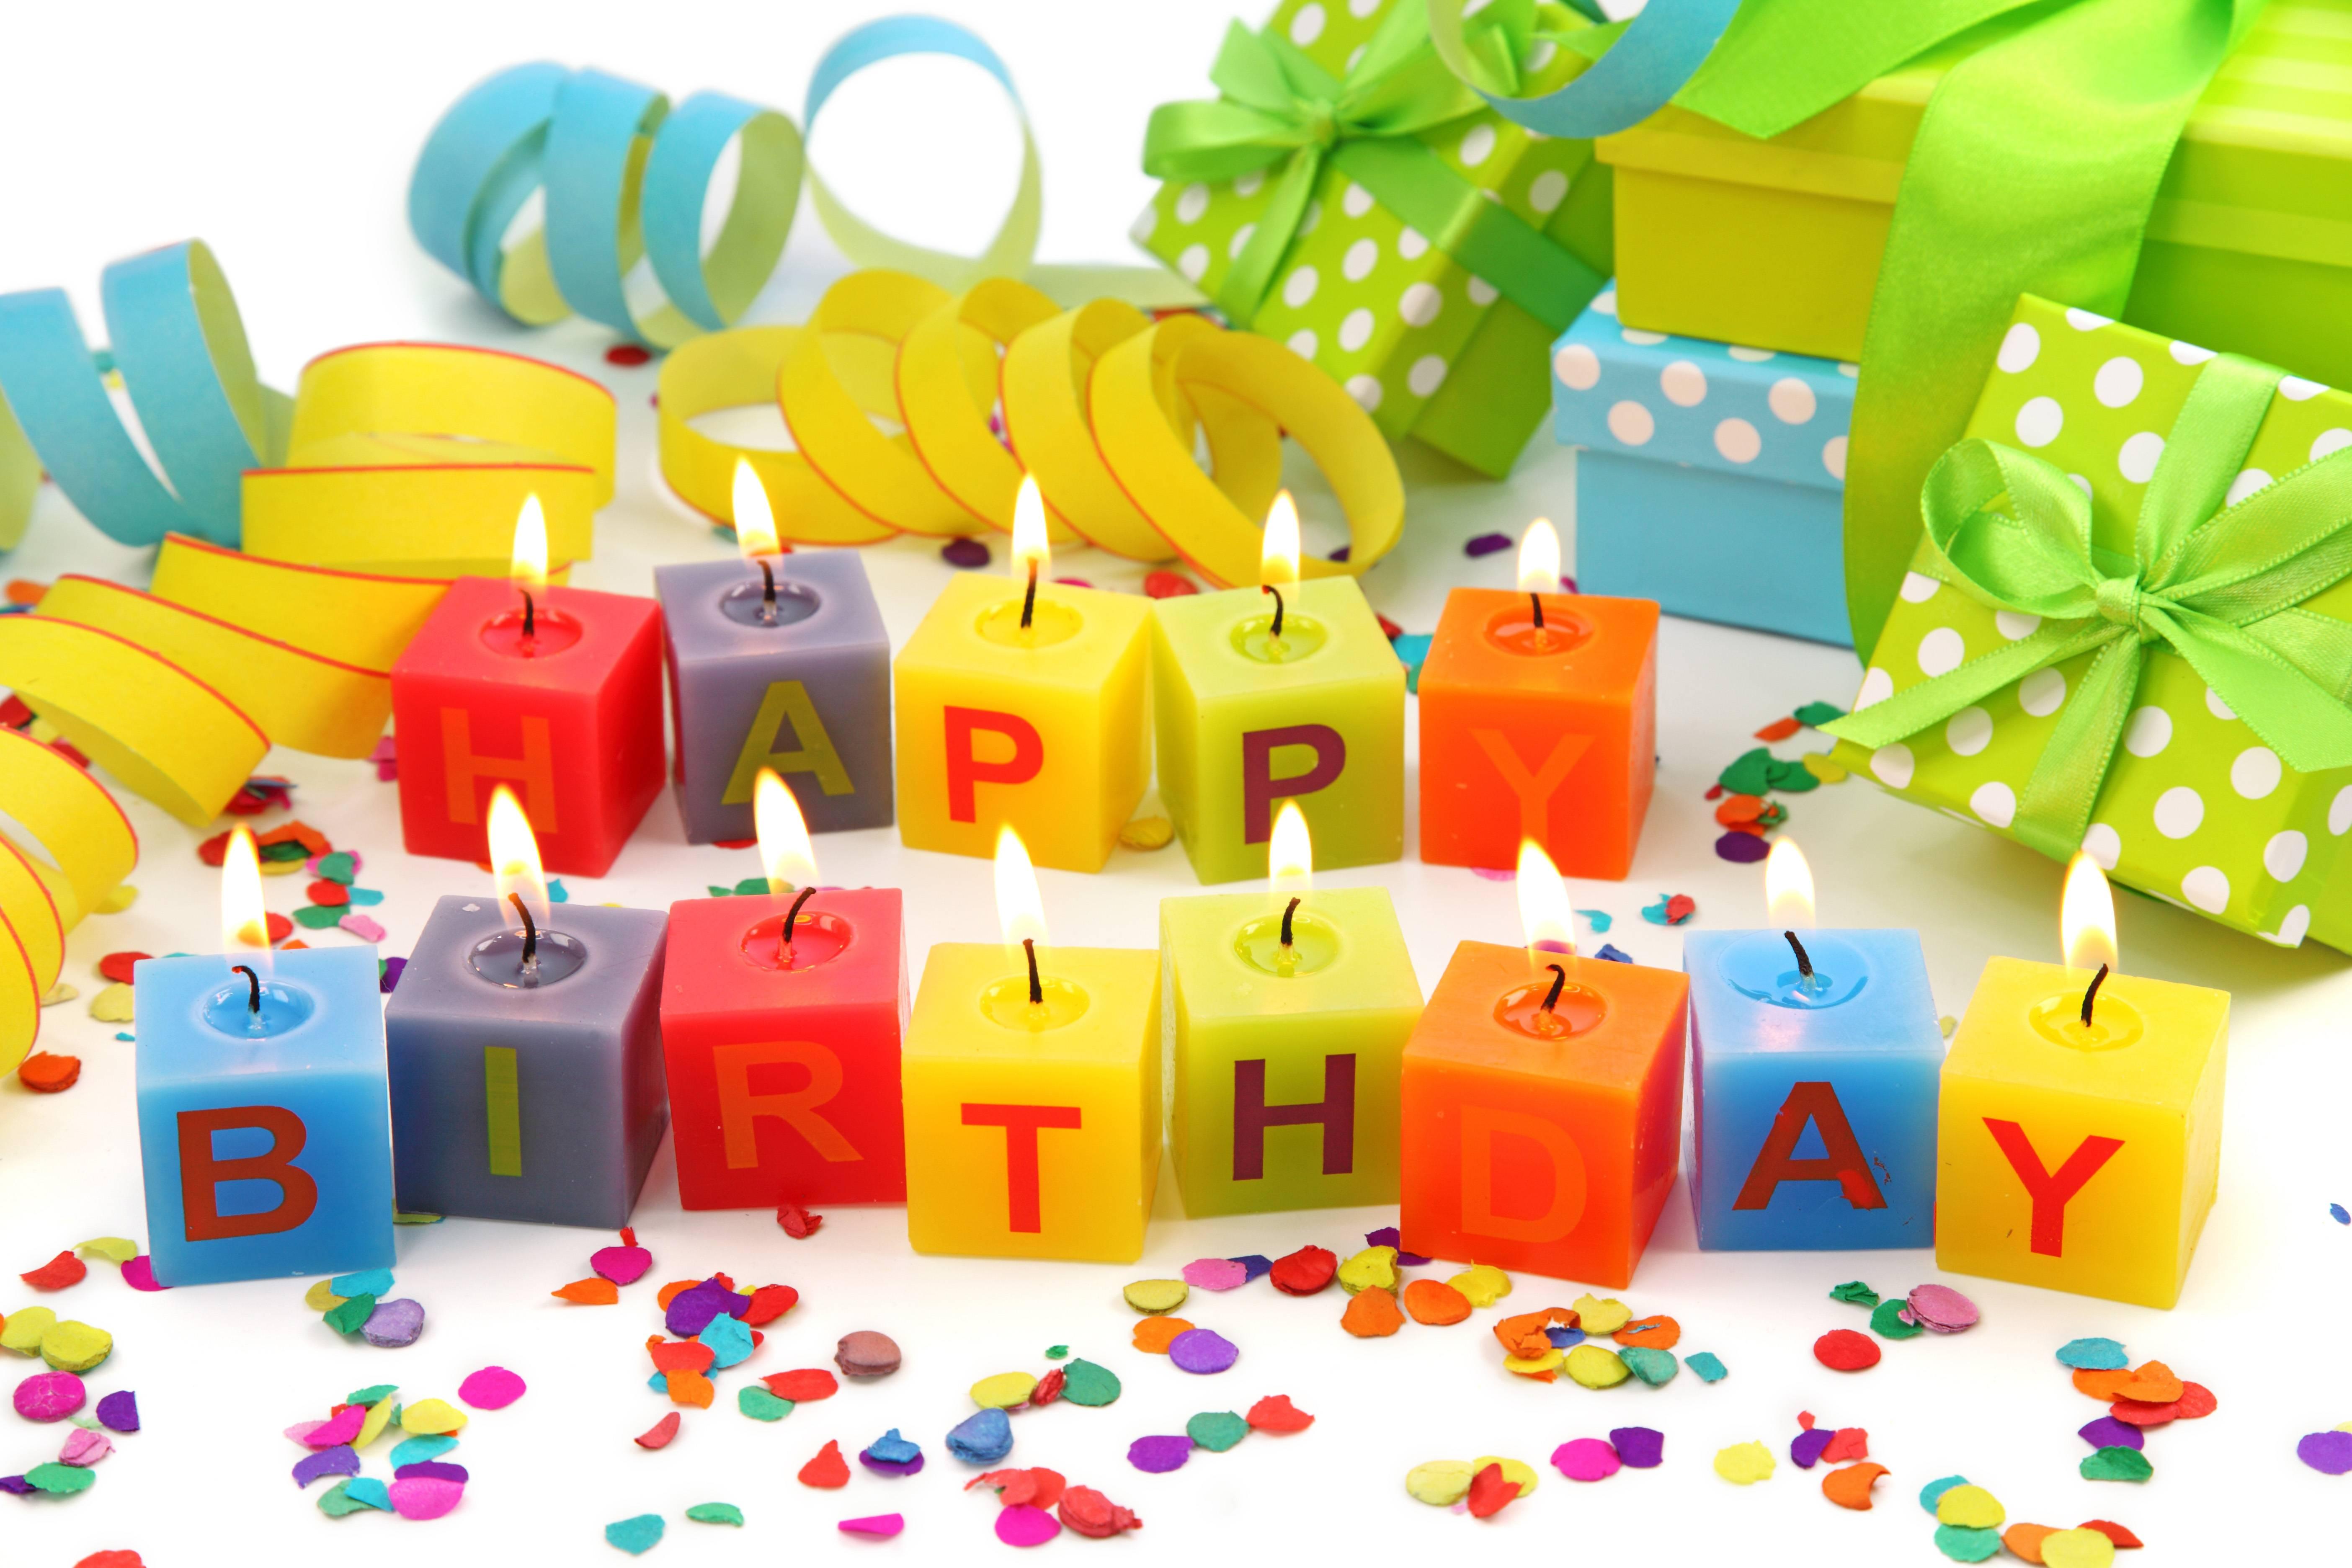 Happy Birthday Wallpaper Desktop | Free HD Desktop Wallpaper ...